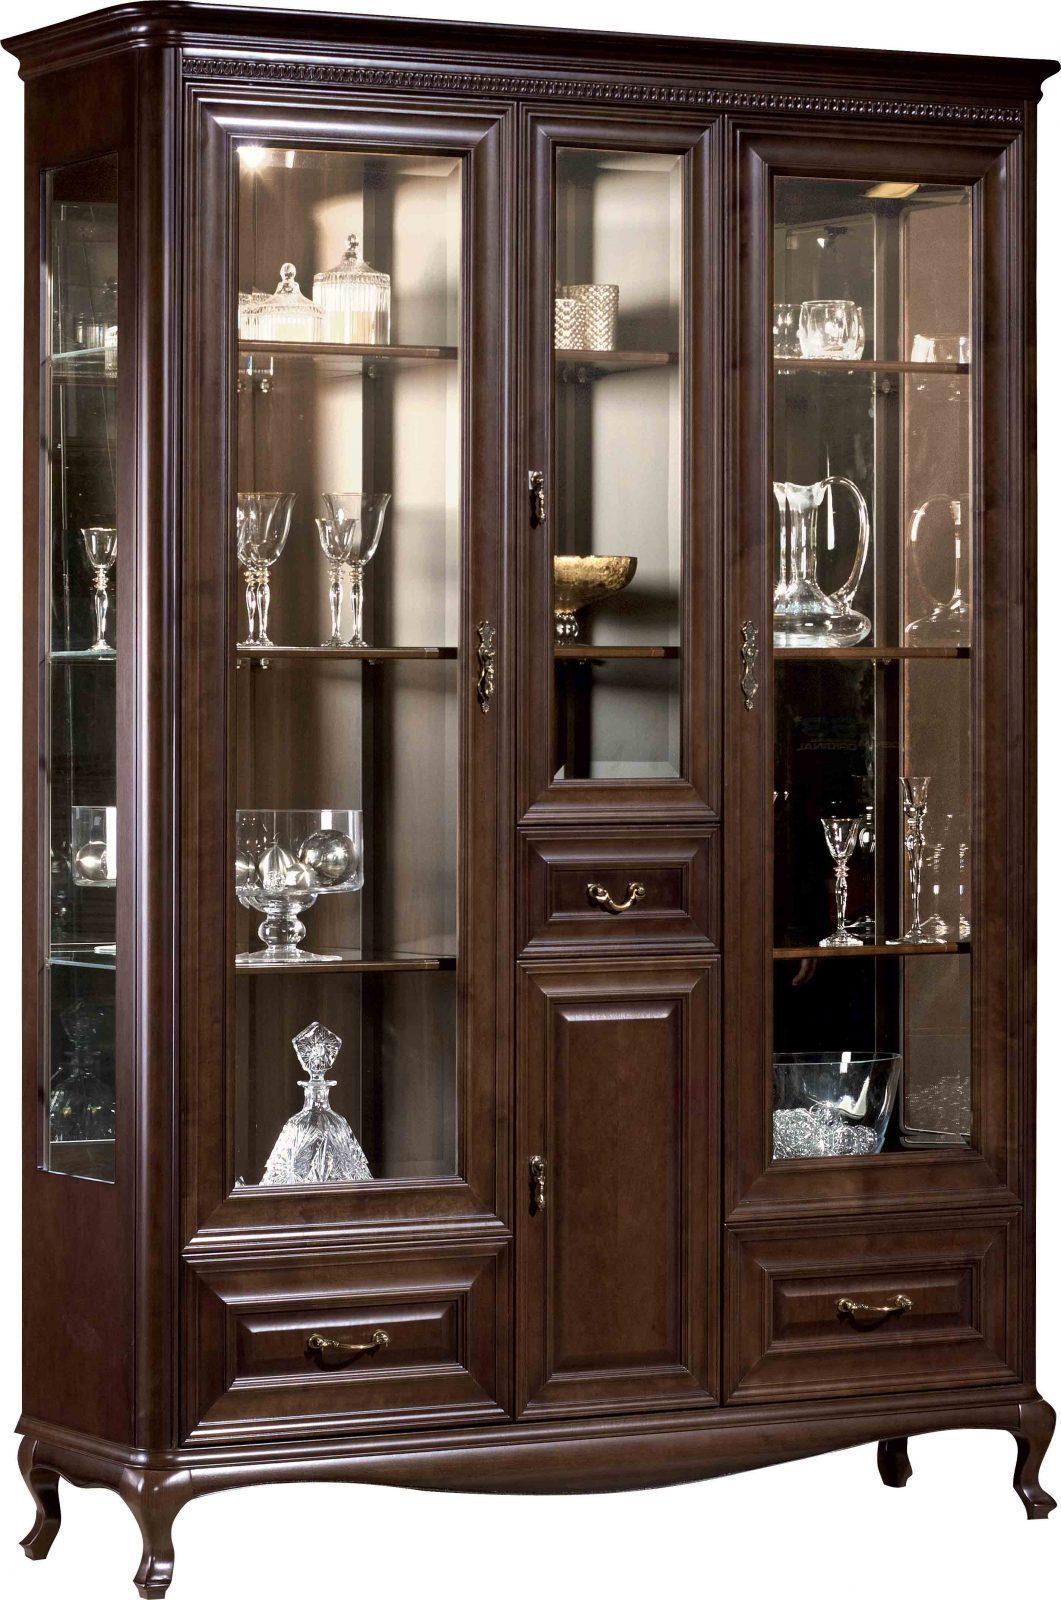 Тройна витрина V-W3 Verona - арт мебели естествено дърво